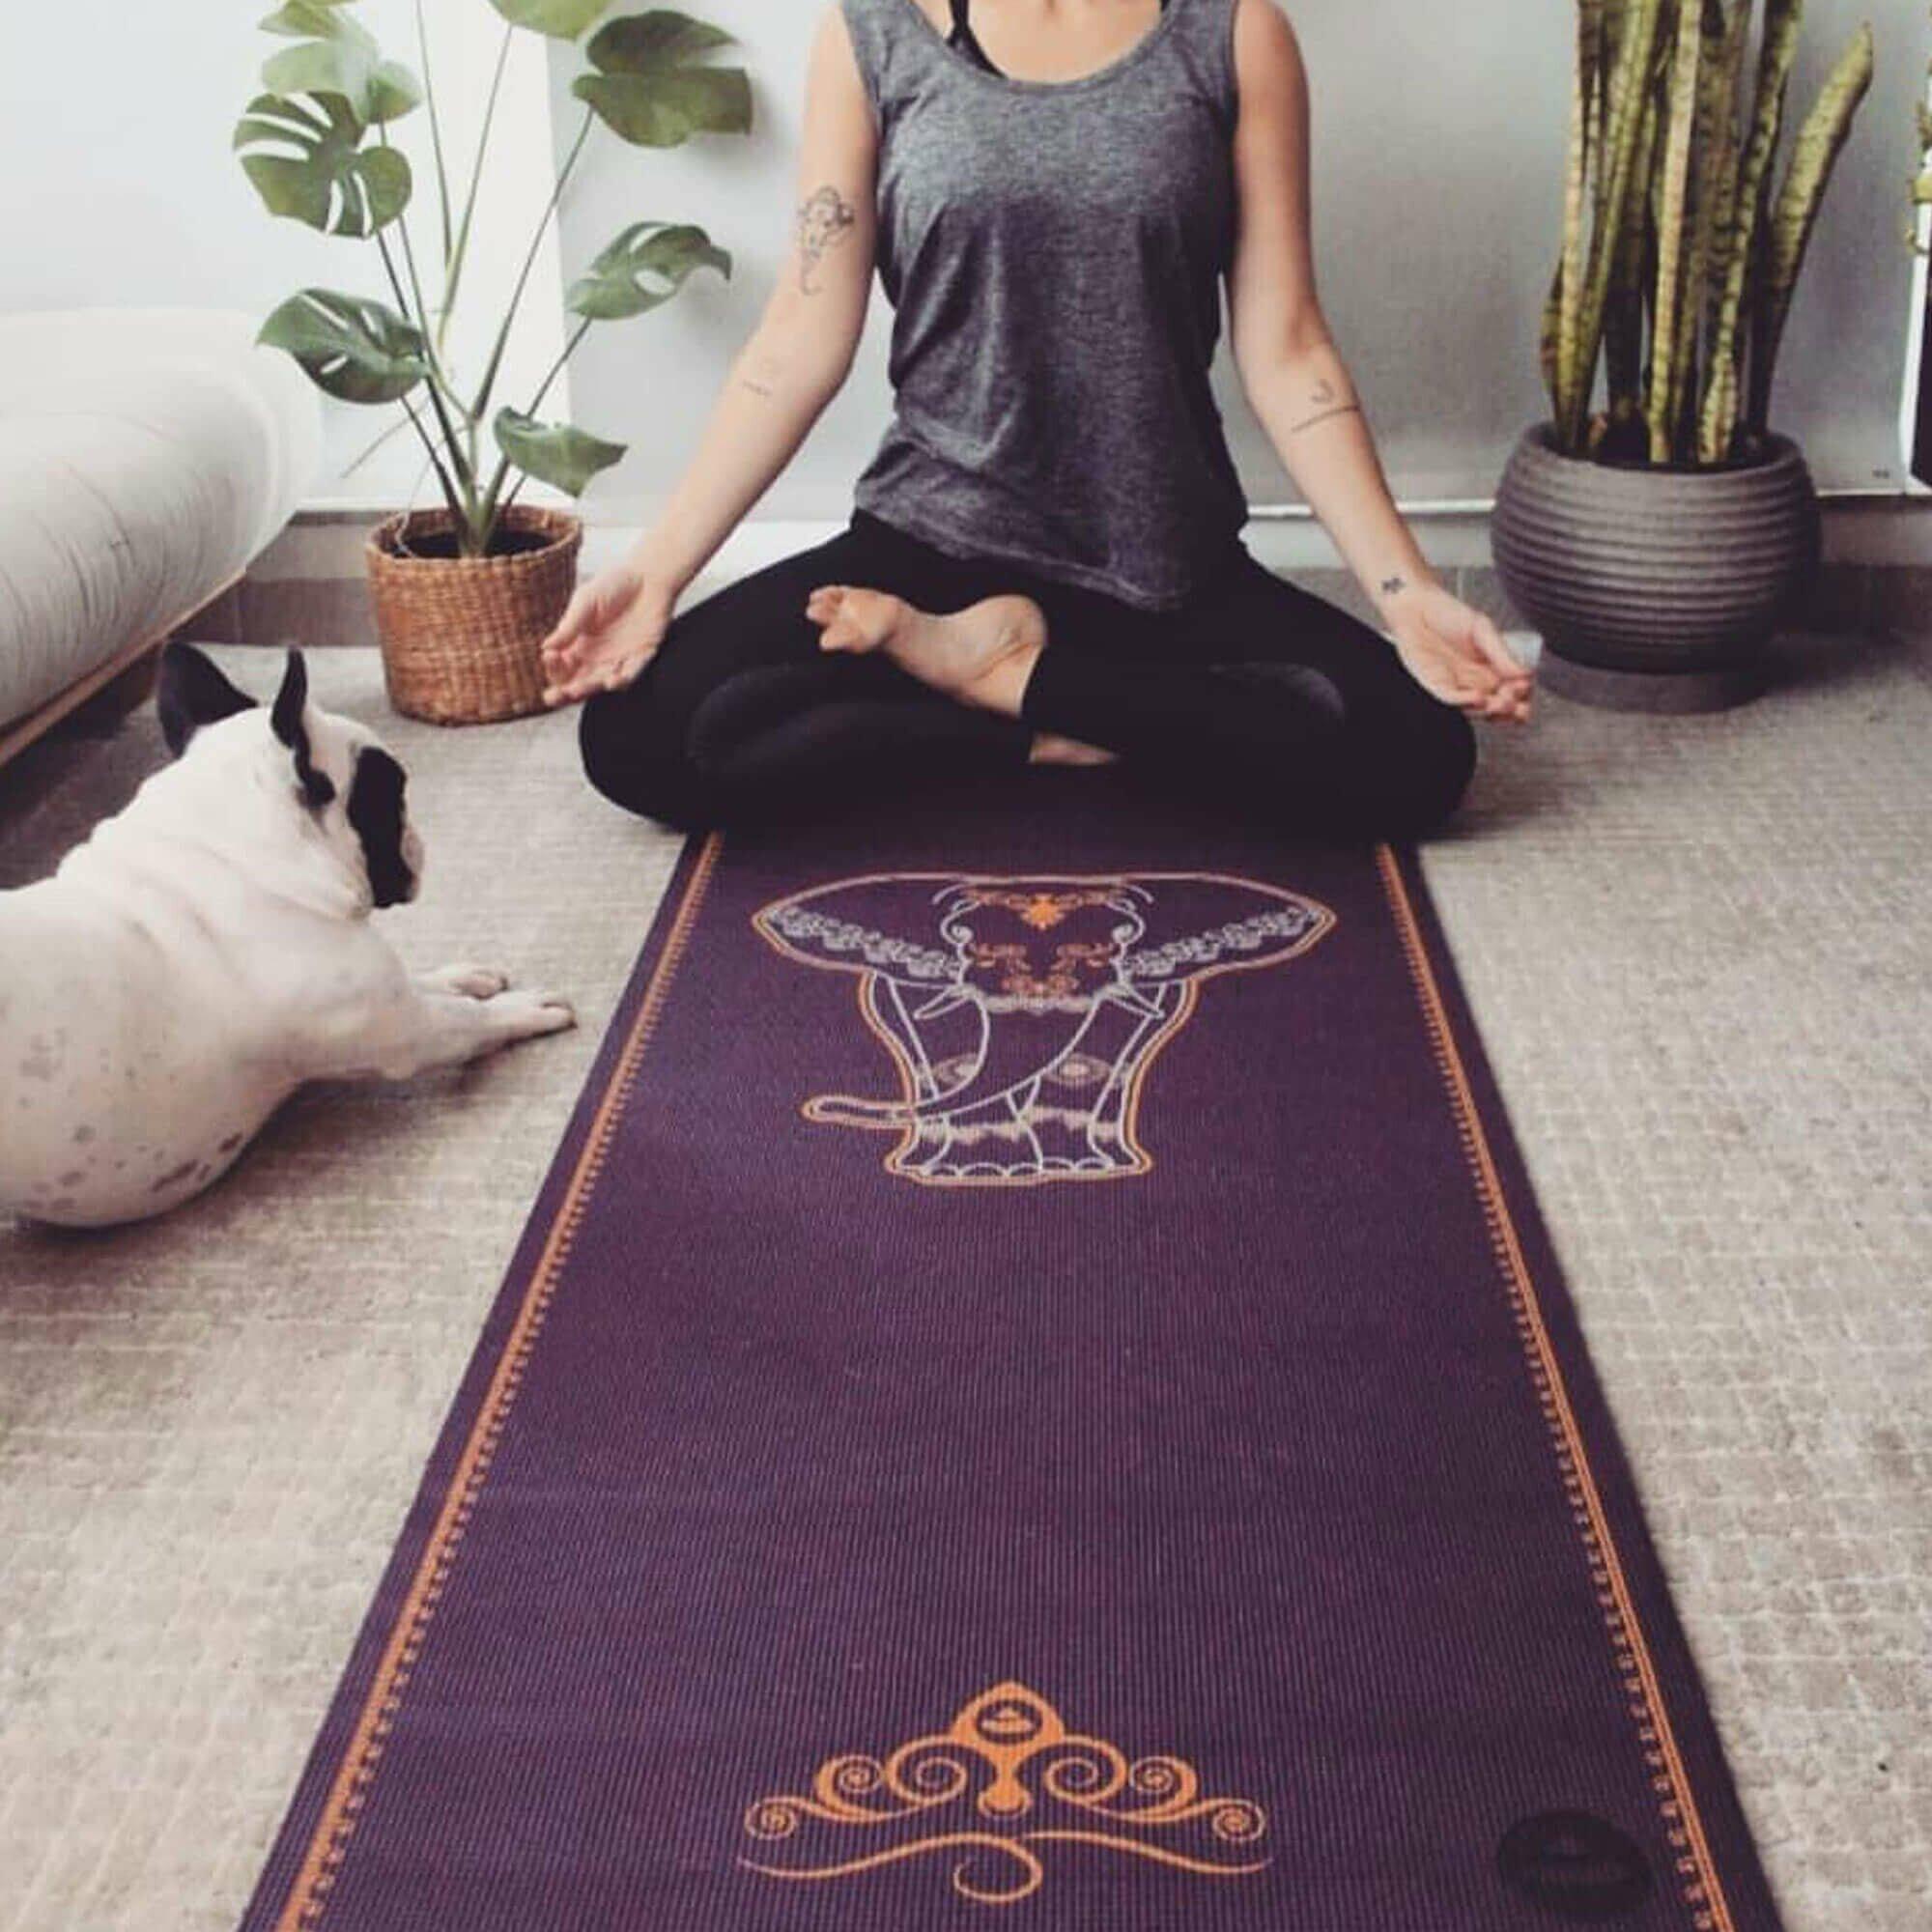 tapete-yoga-elefante-yogateria-6